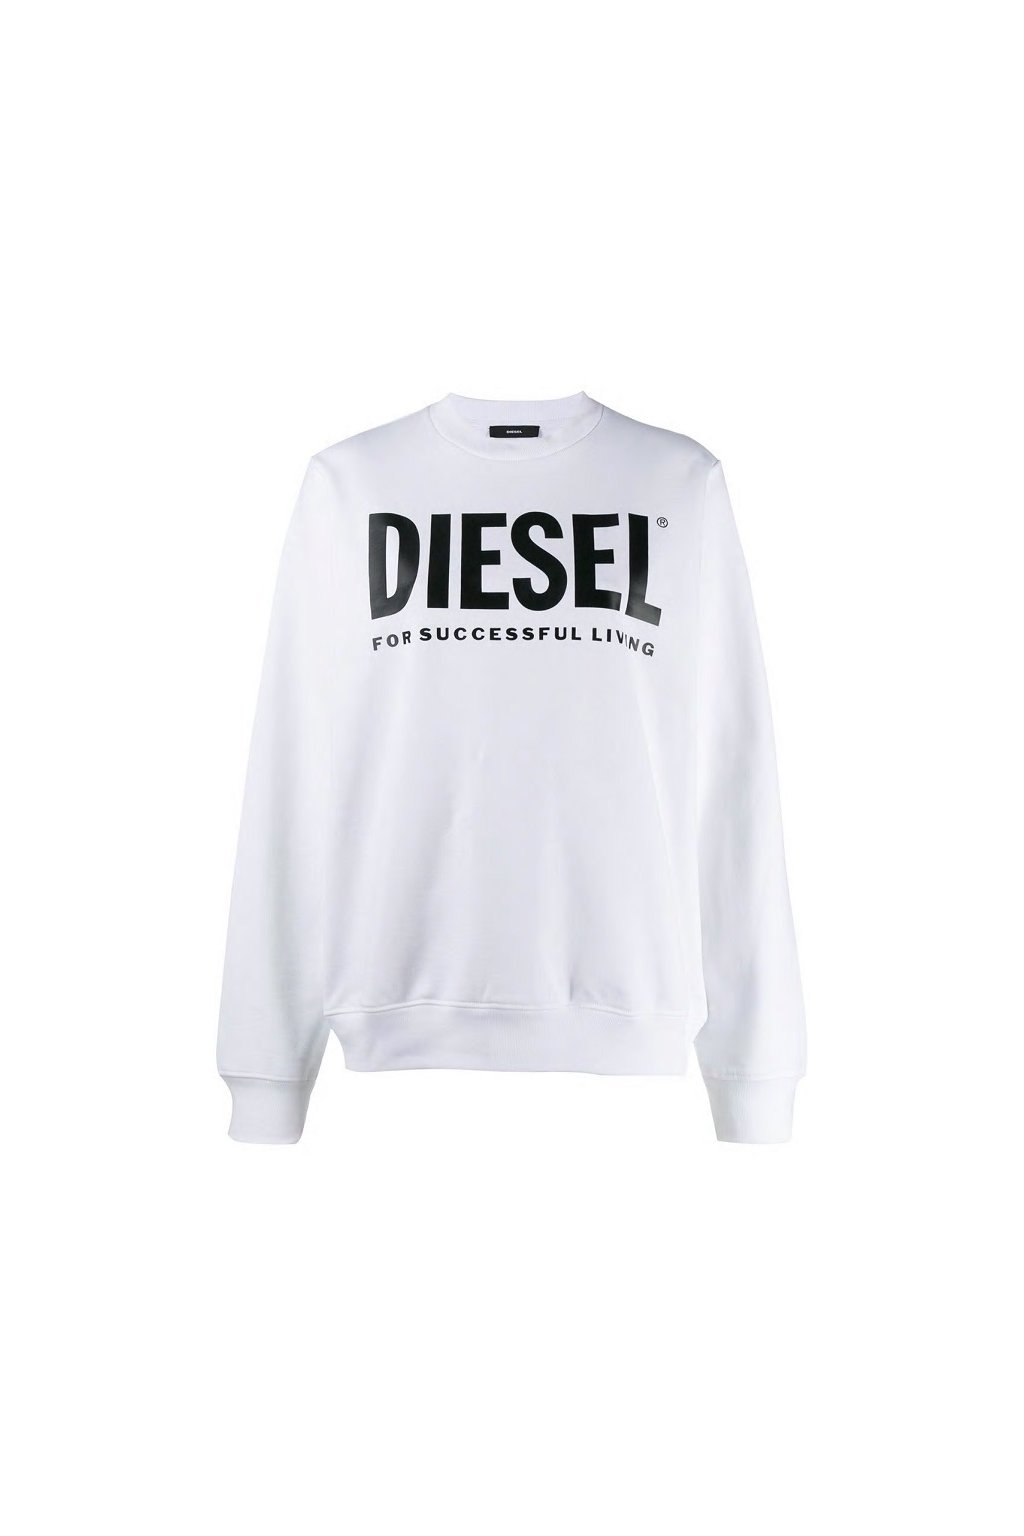 00SYW9 0IAJH Dámská mikina Diesel F Ang bílá